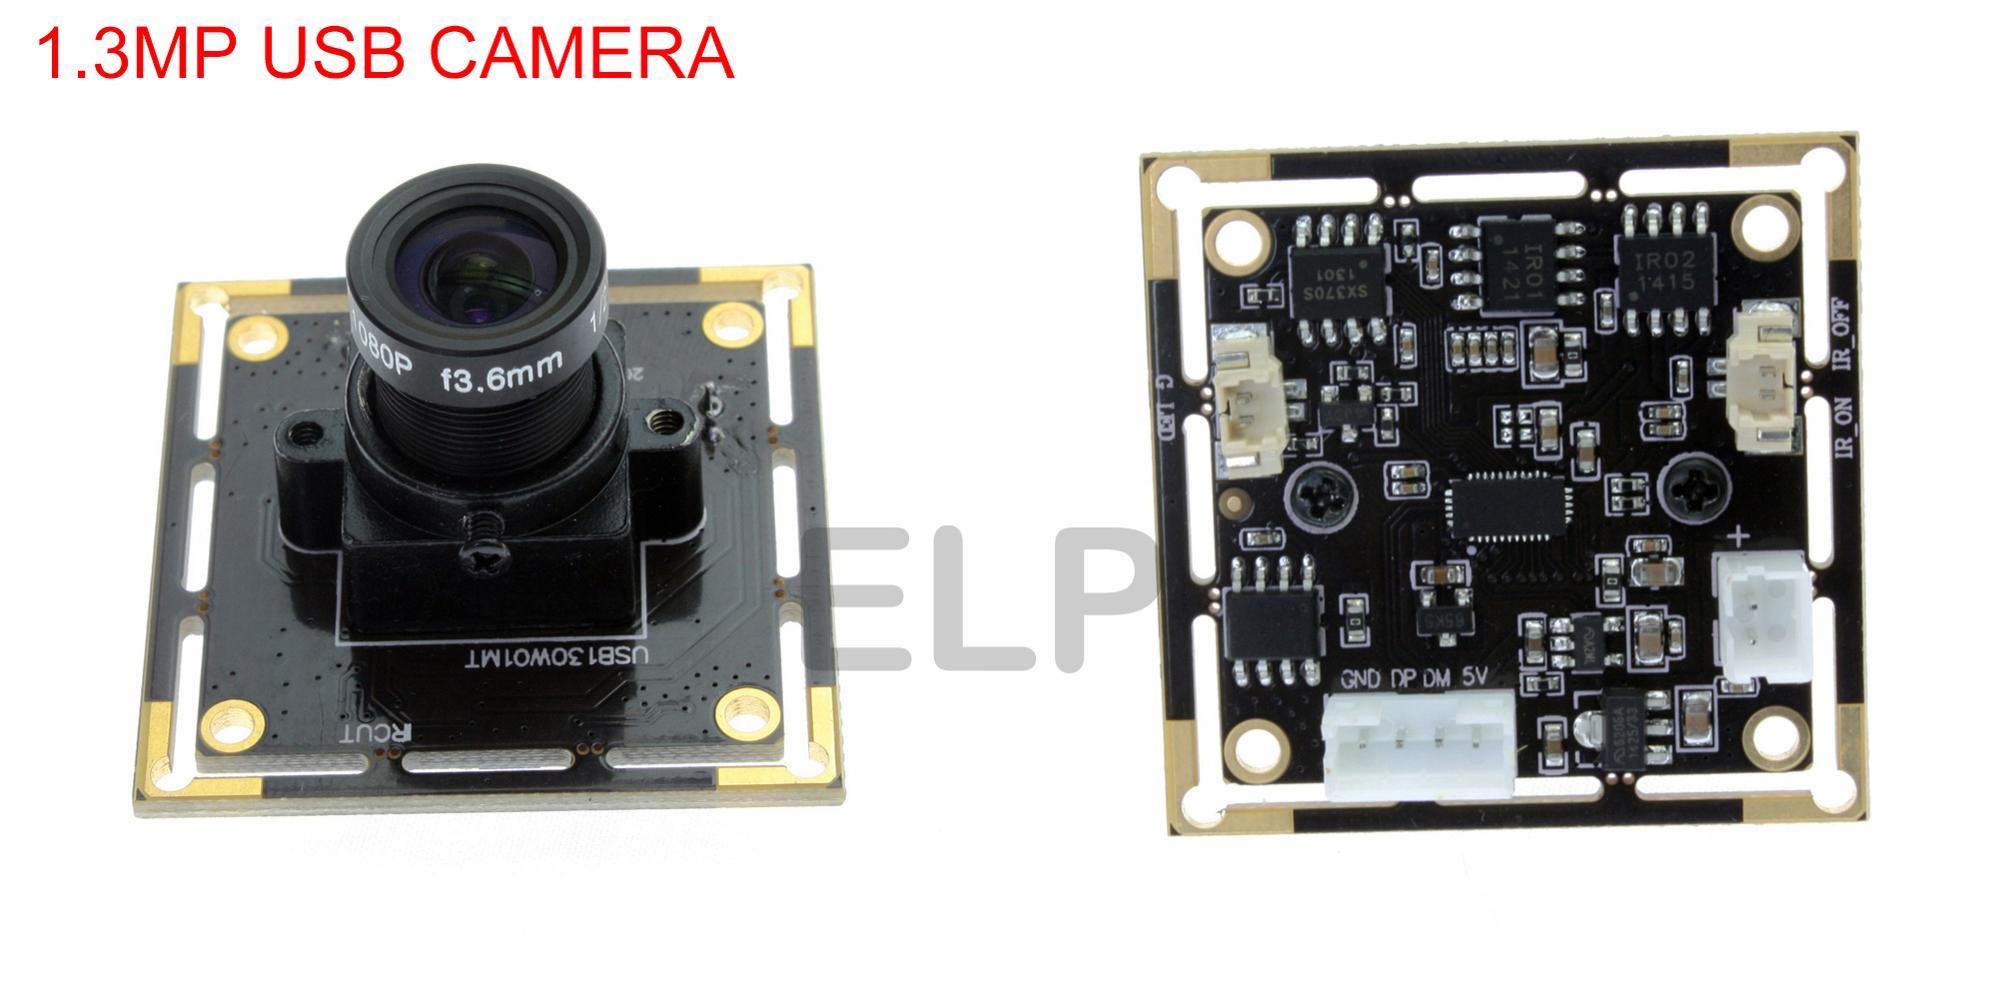 ELP USB Web Camera 1.3m pixel Aptina AR00130 HD Color Image Sensor Low Light Camera Module For Raspberry Pi, Lunix,Android